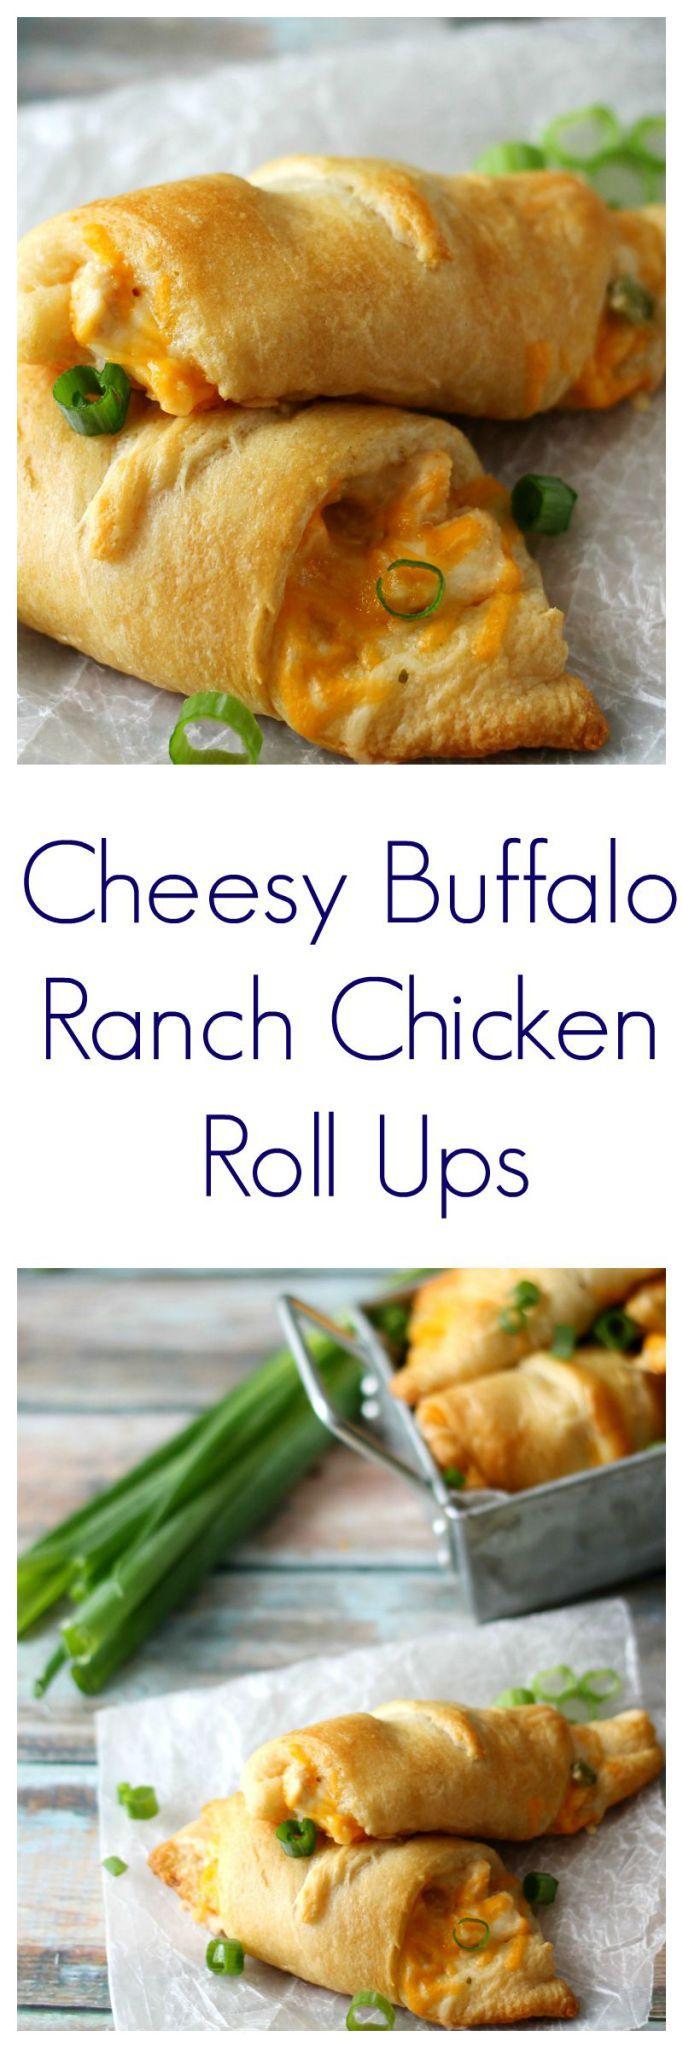 Cheesy Buffalo Ranch Chicken Roll Ups